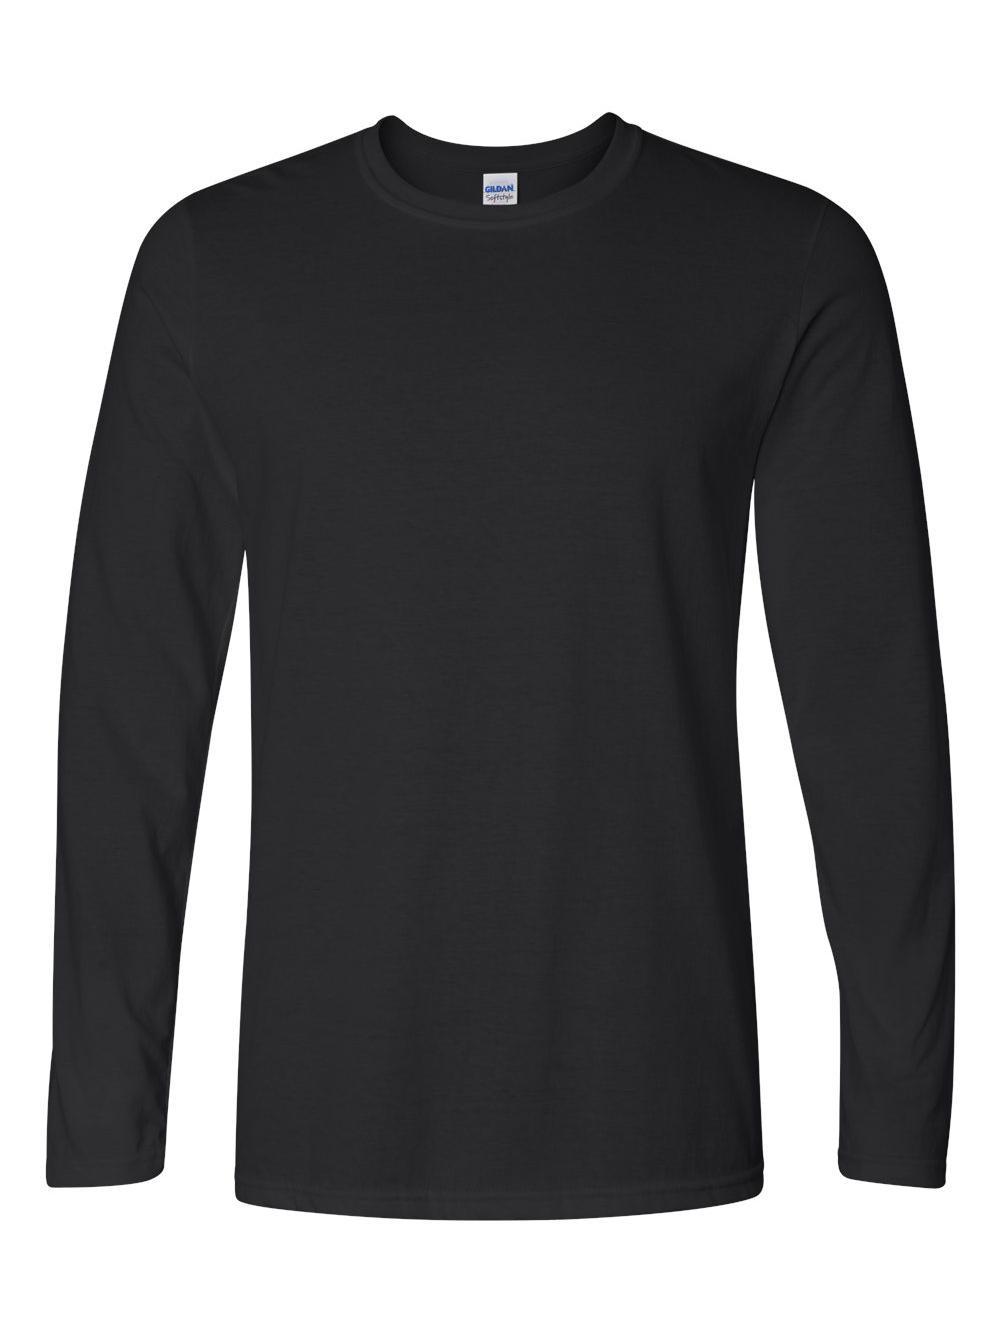 Gildan-Softstyle-Long-Sleeve-T-Shirt-64400 thumbnail 3